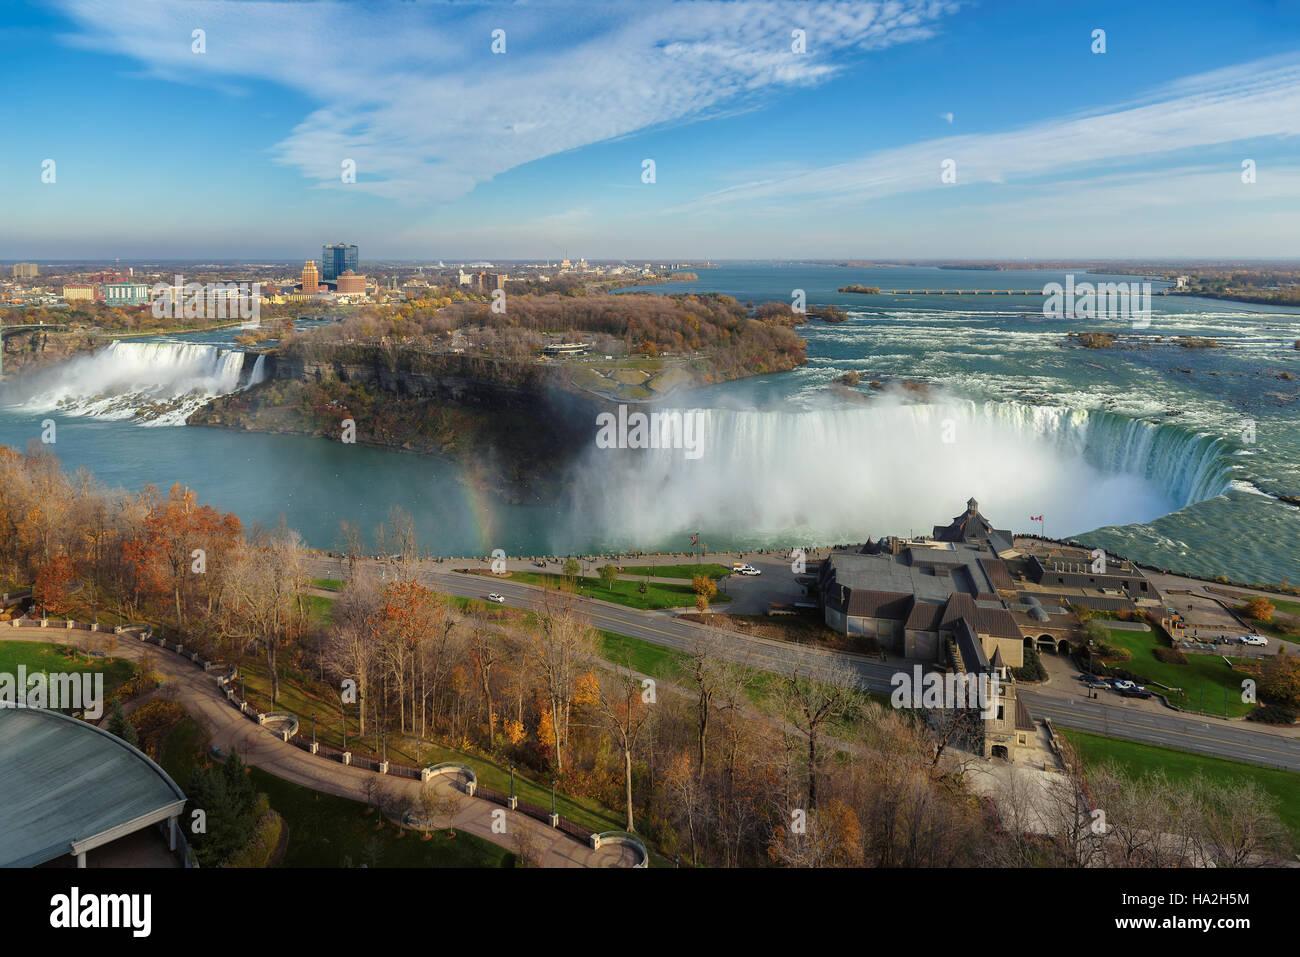 Niagara Falls aerial view - Stock Image